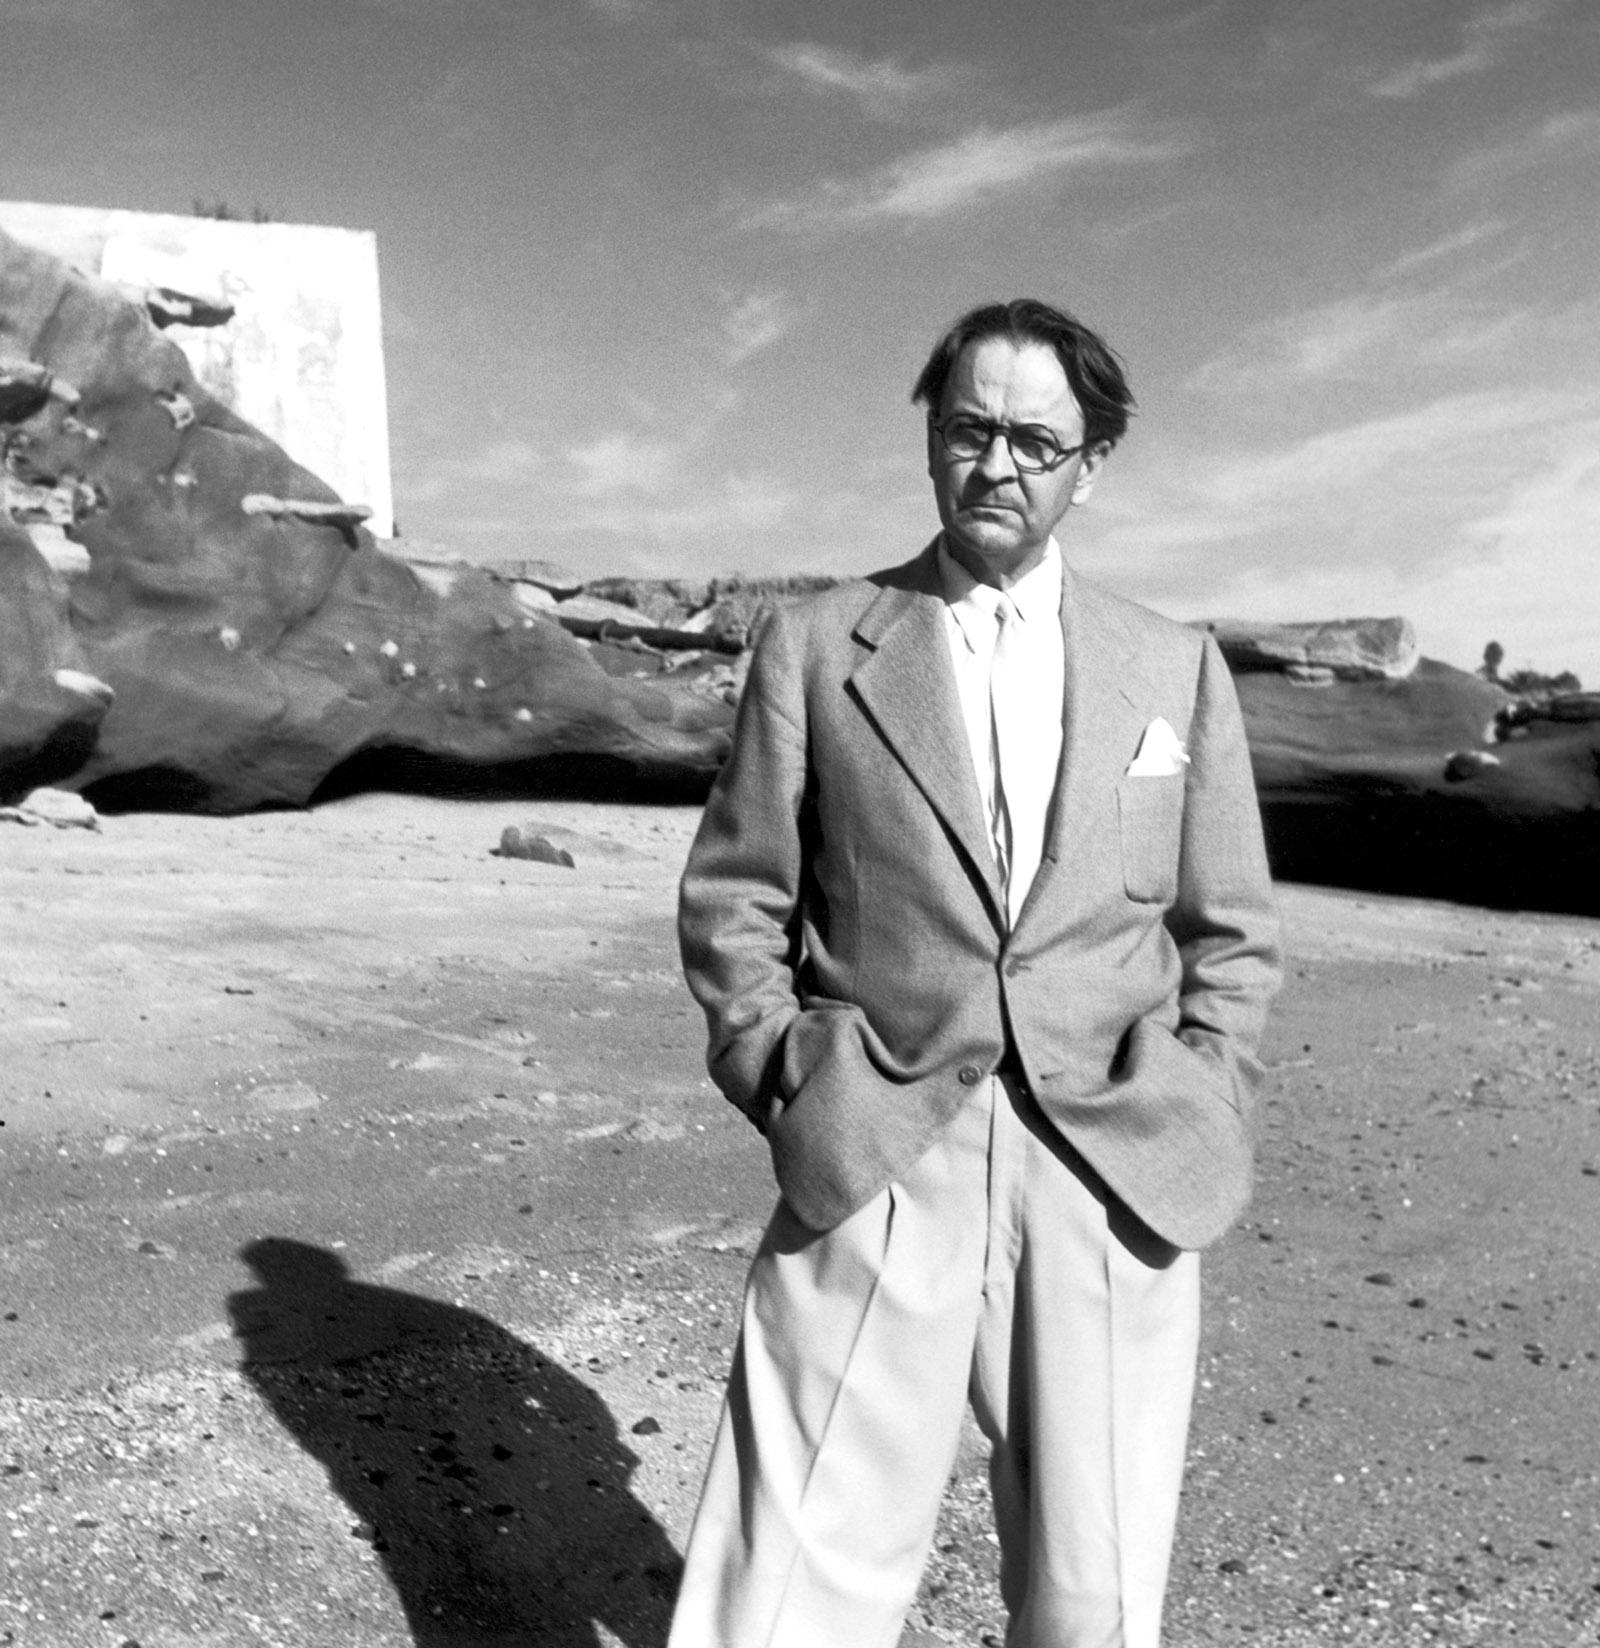 Raymond Chandler, 1947; photograph by George Platt Lynes